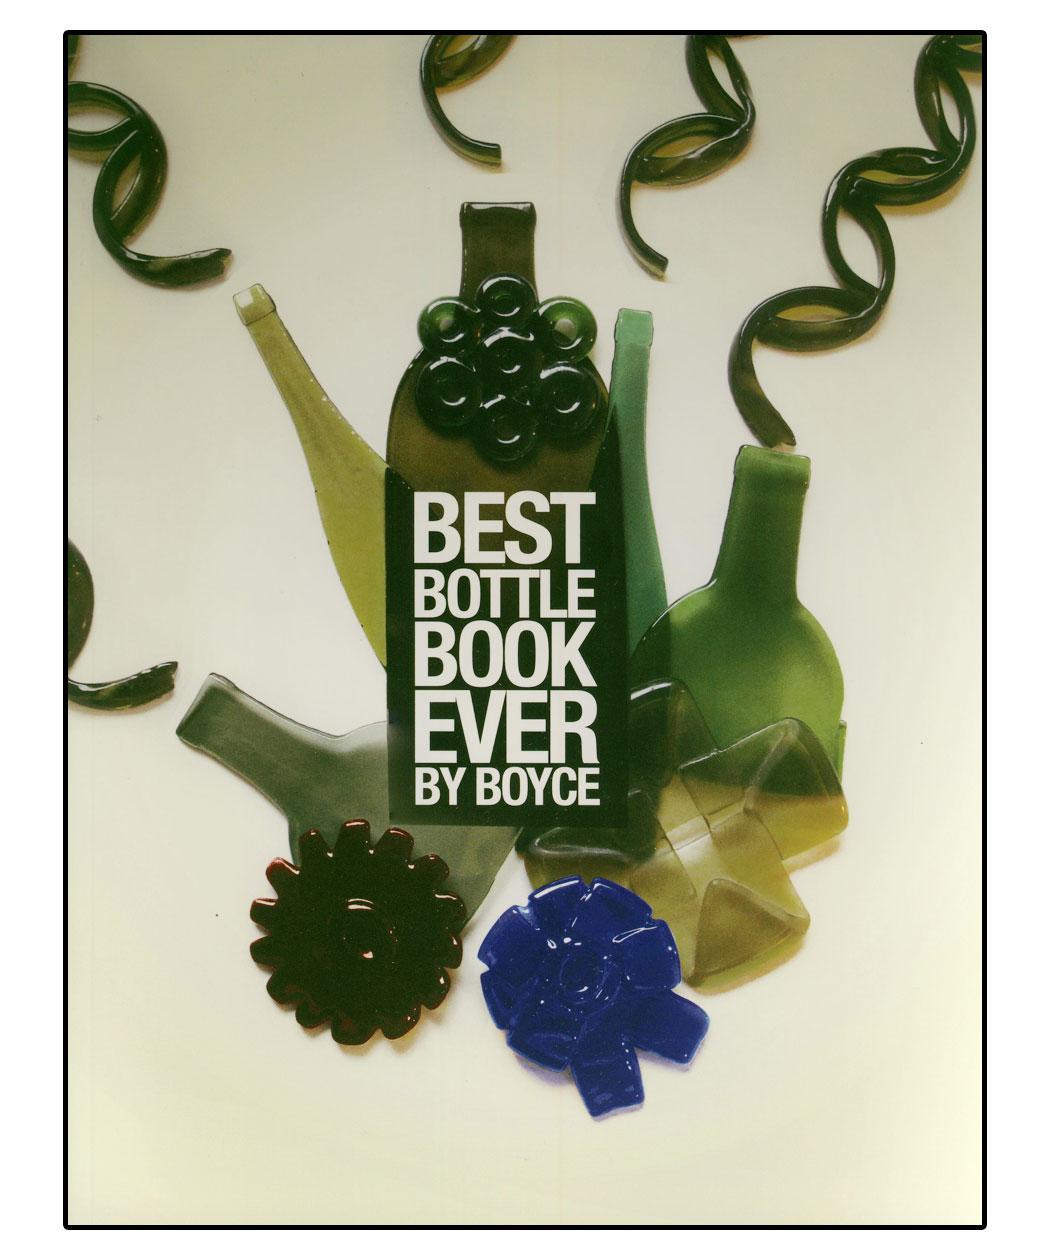 Best Bottle Book Ever